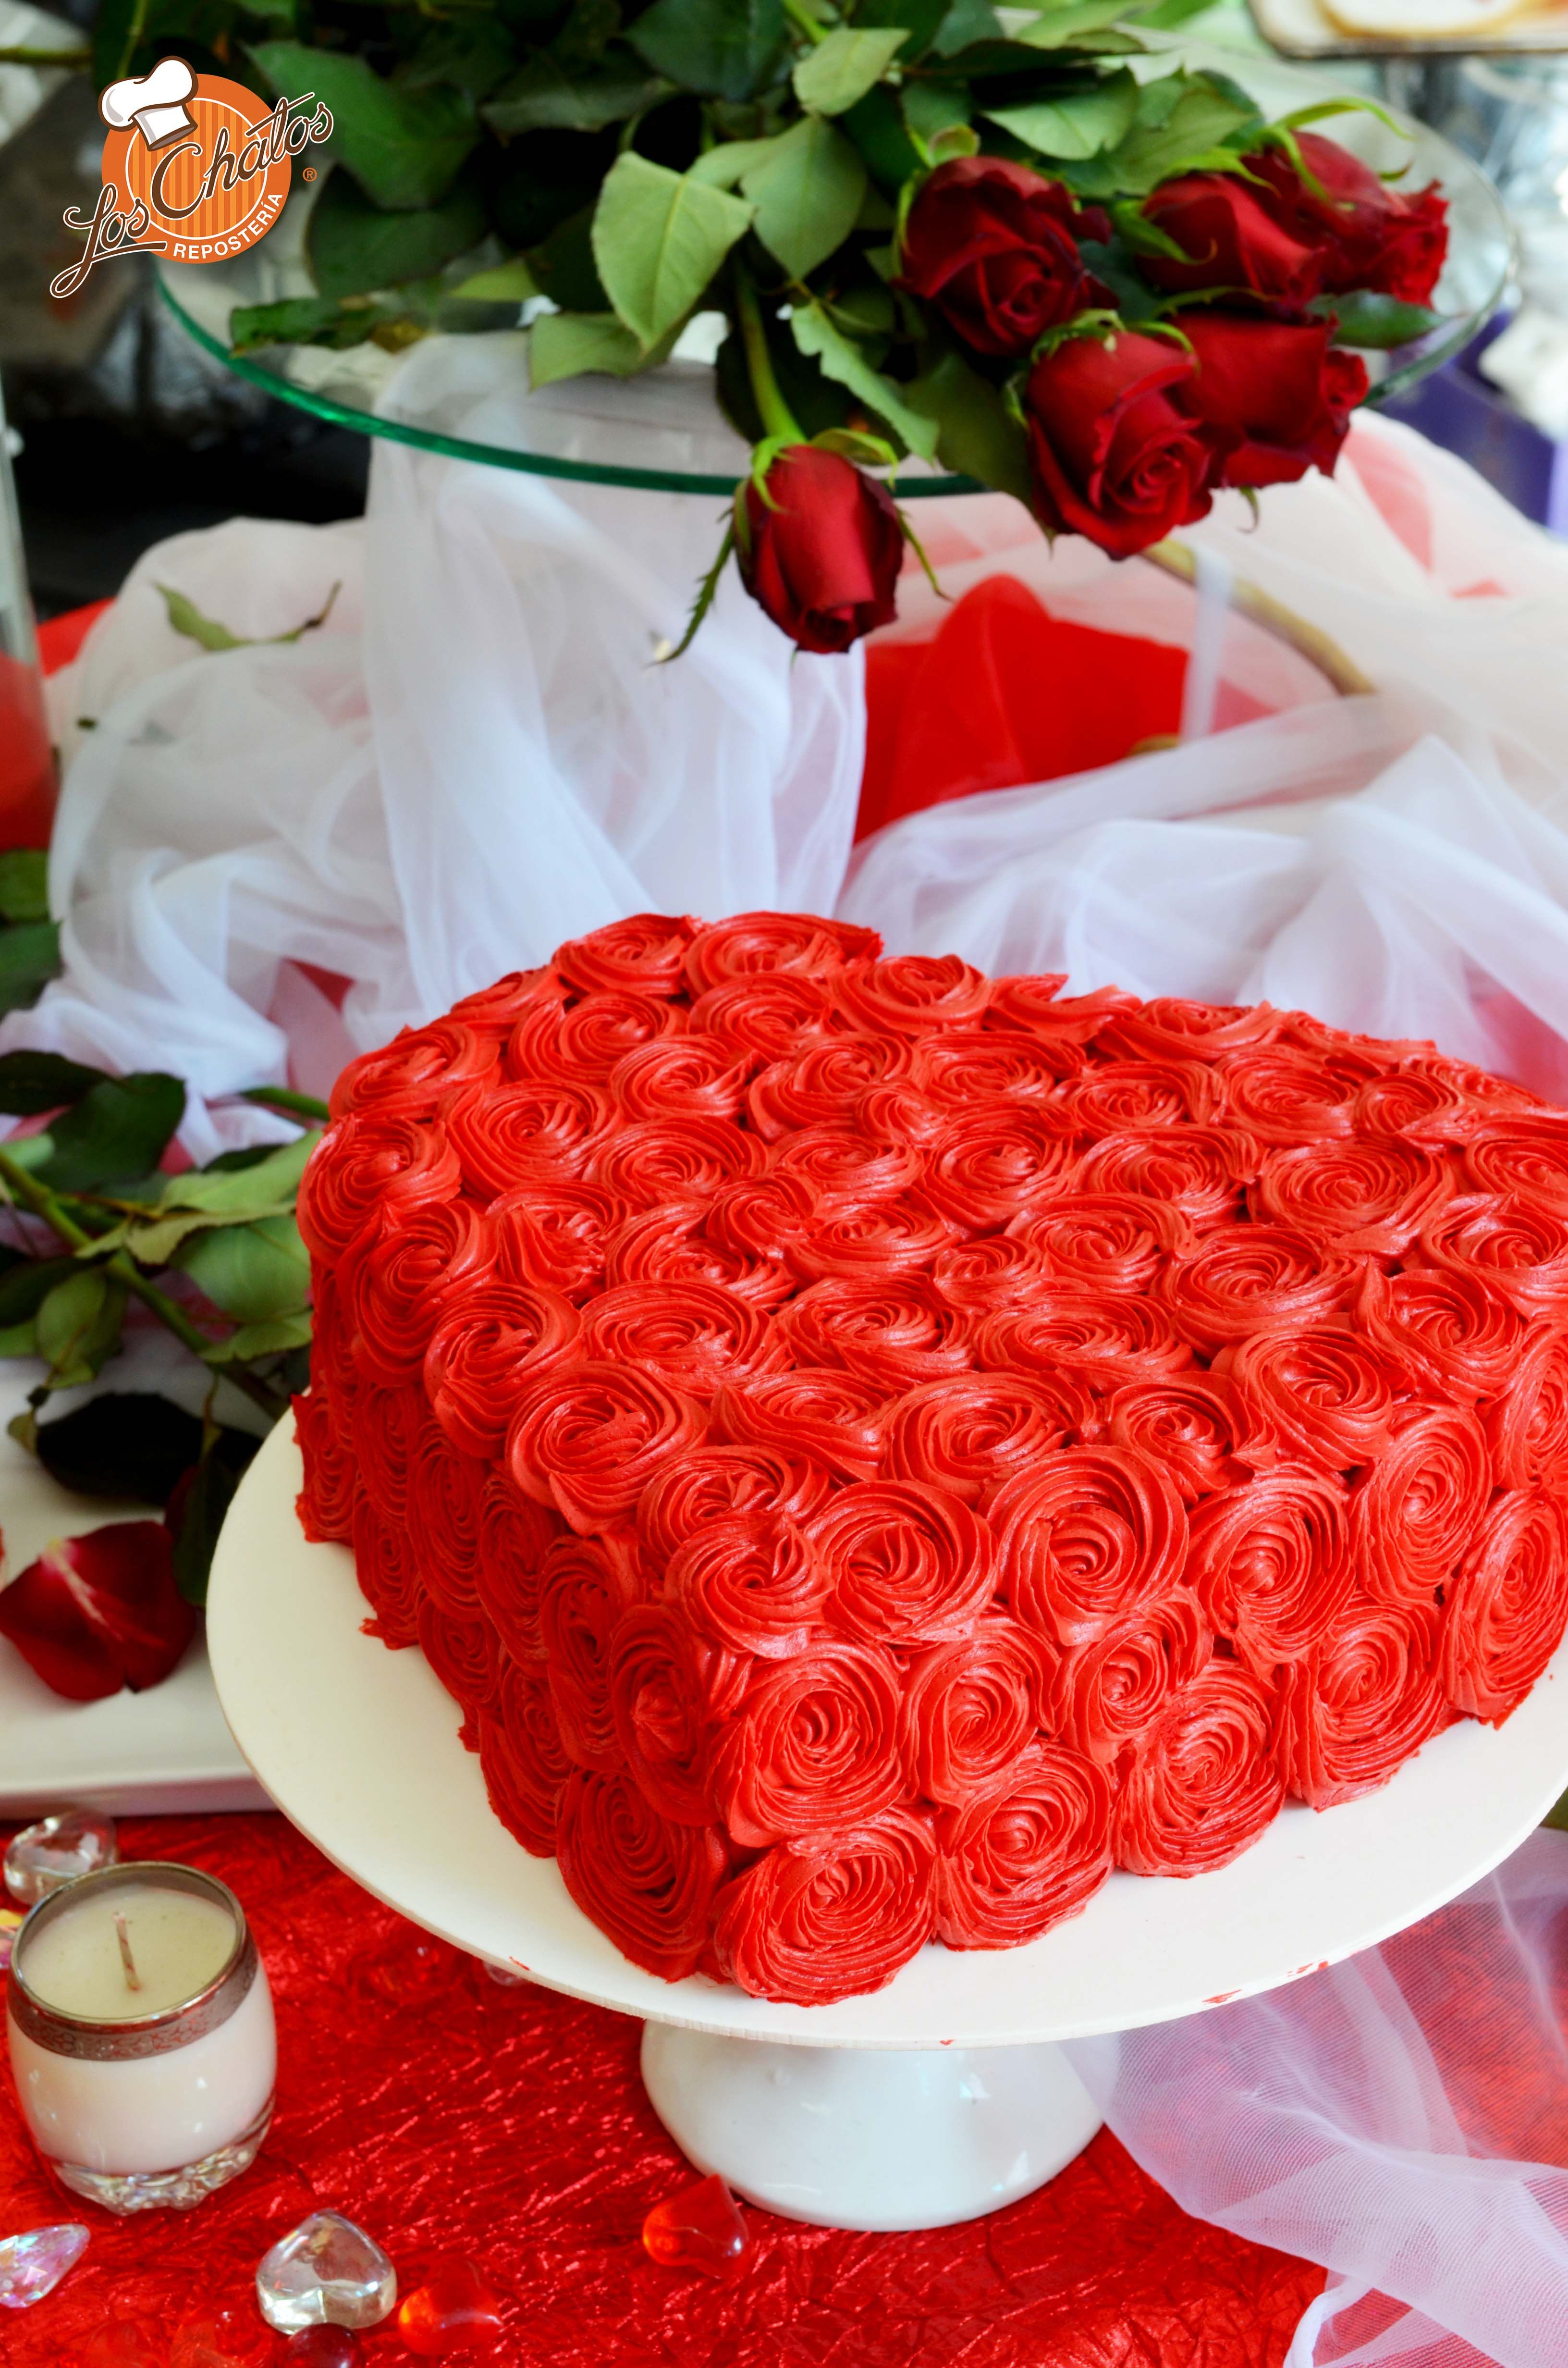 Pastel de queso zarzamora con decoraci n de rosas for Decoracion san valentin pinterest